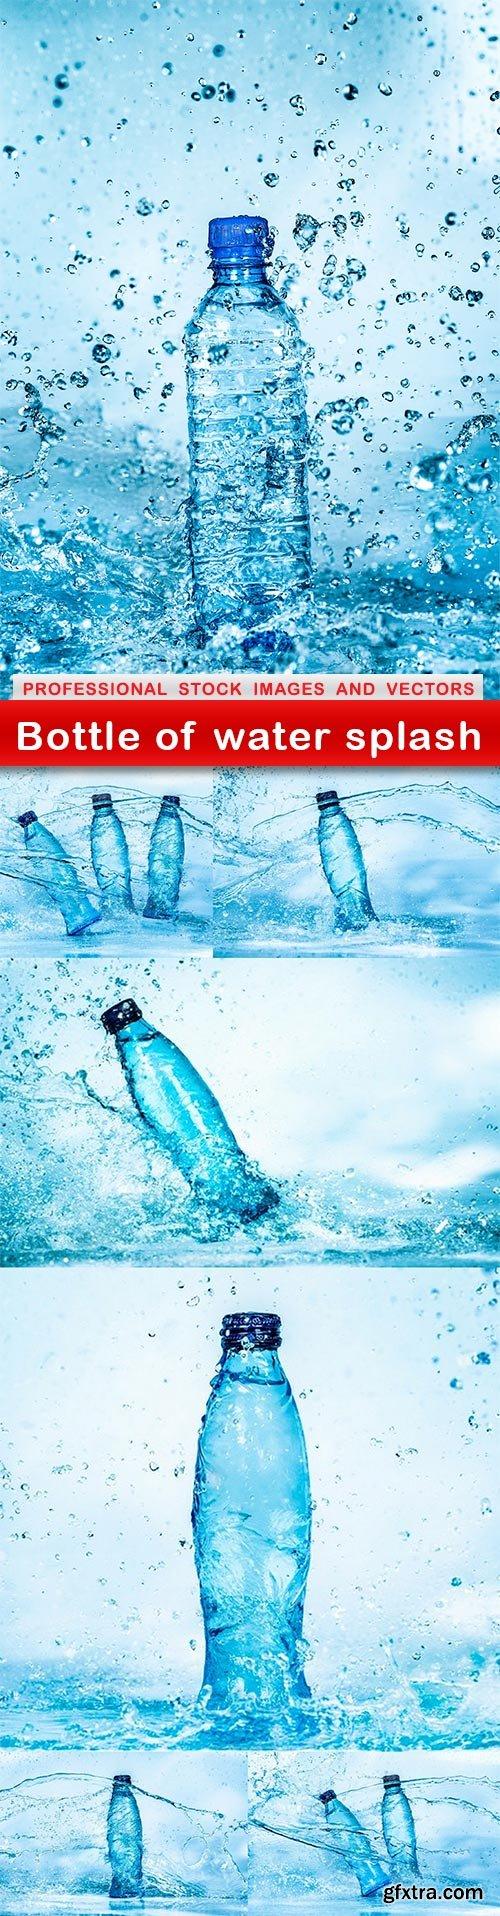 Bottle of water splash - 7 UHQ JPEG